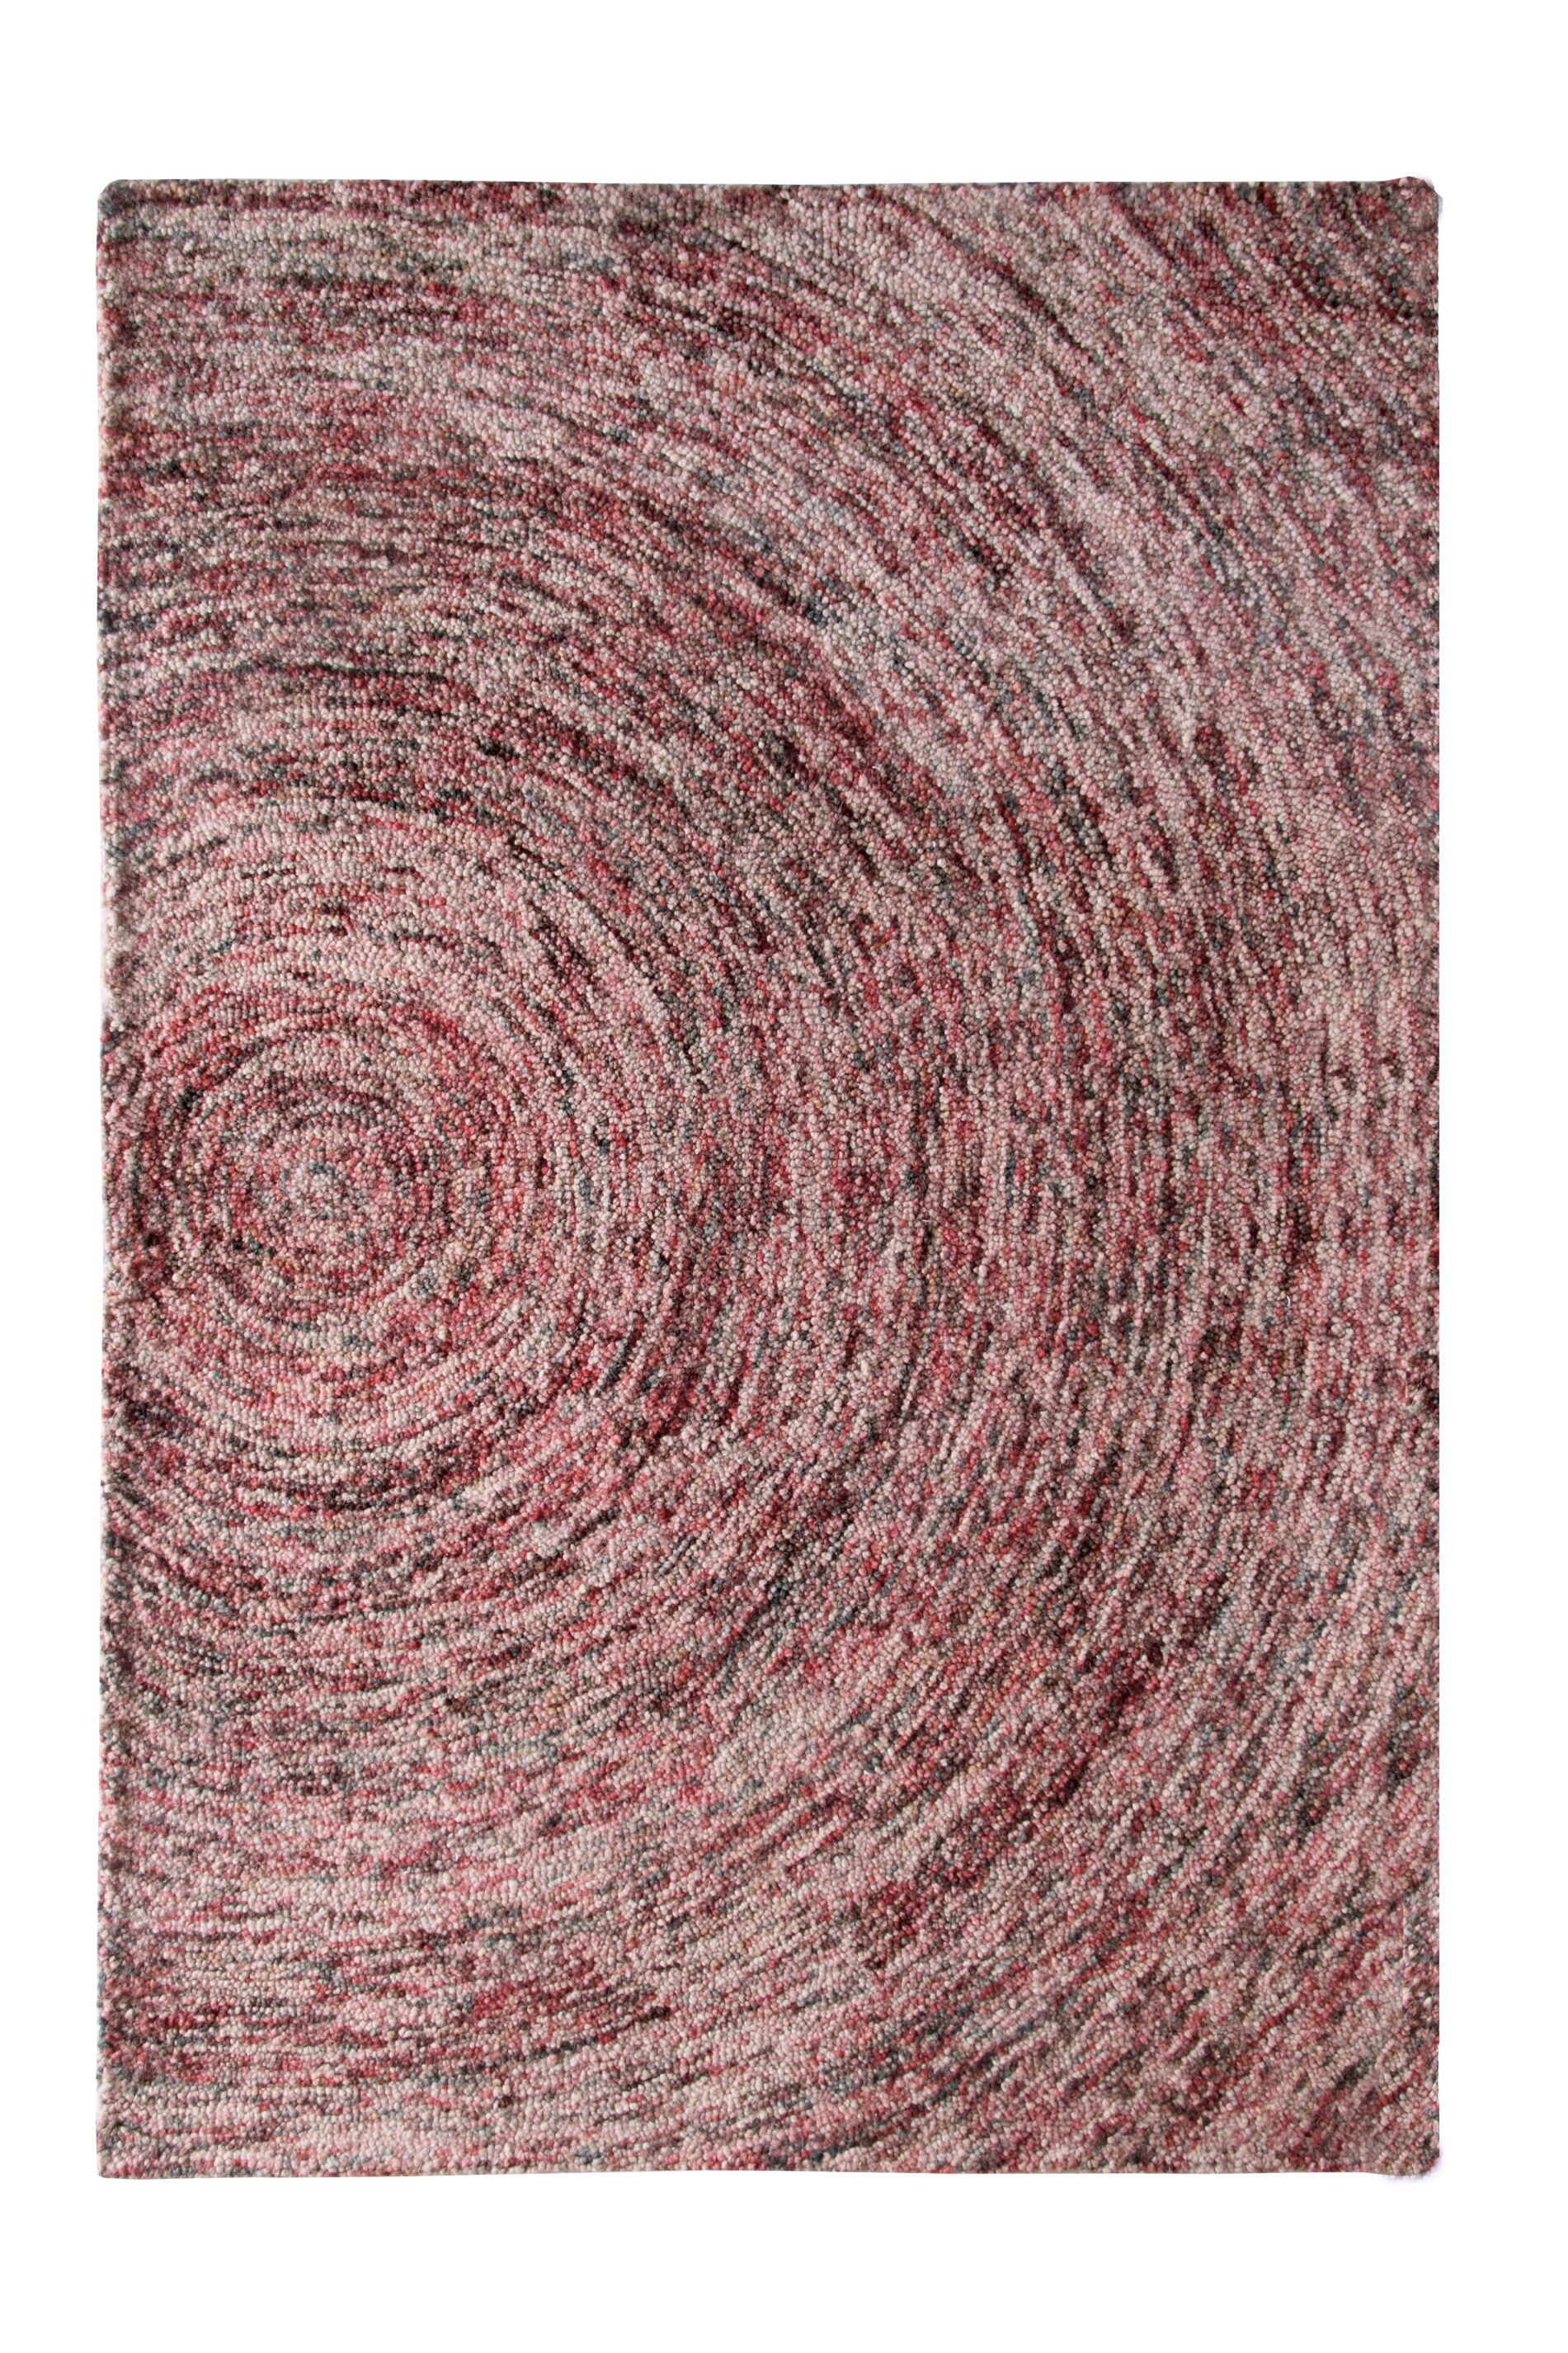 Cameron Terra Area Rug Rug Size: 4' x 6'